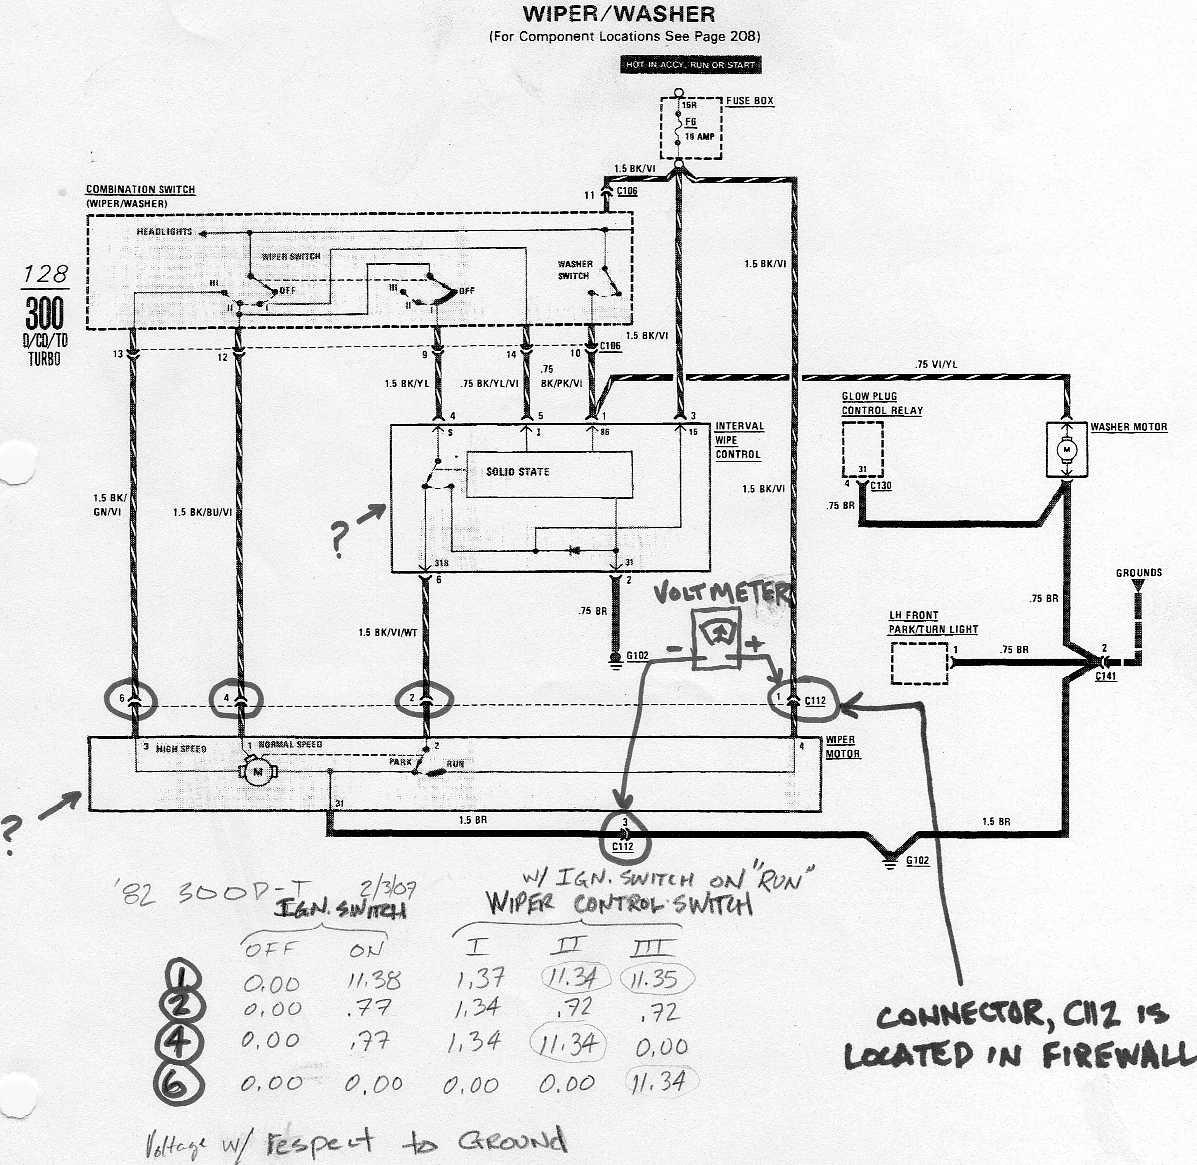 94 S10 Wiper Motor Wiring Diagram